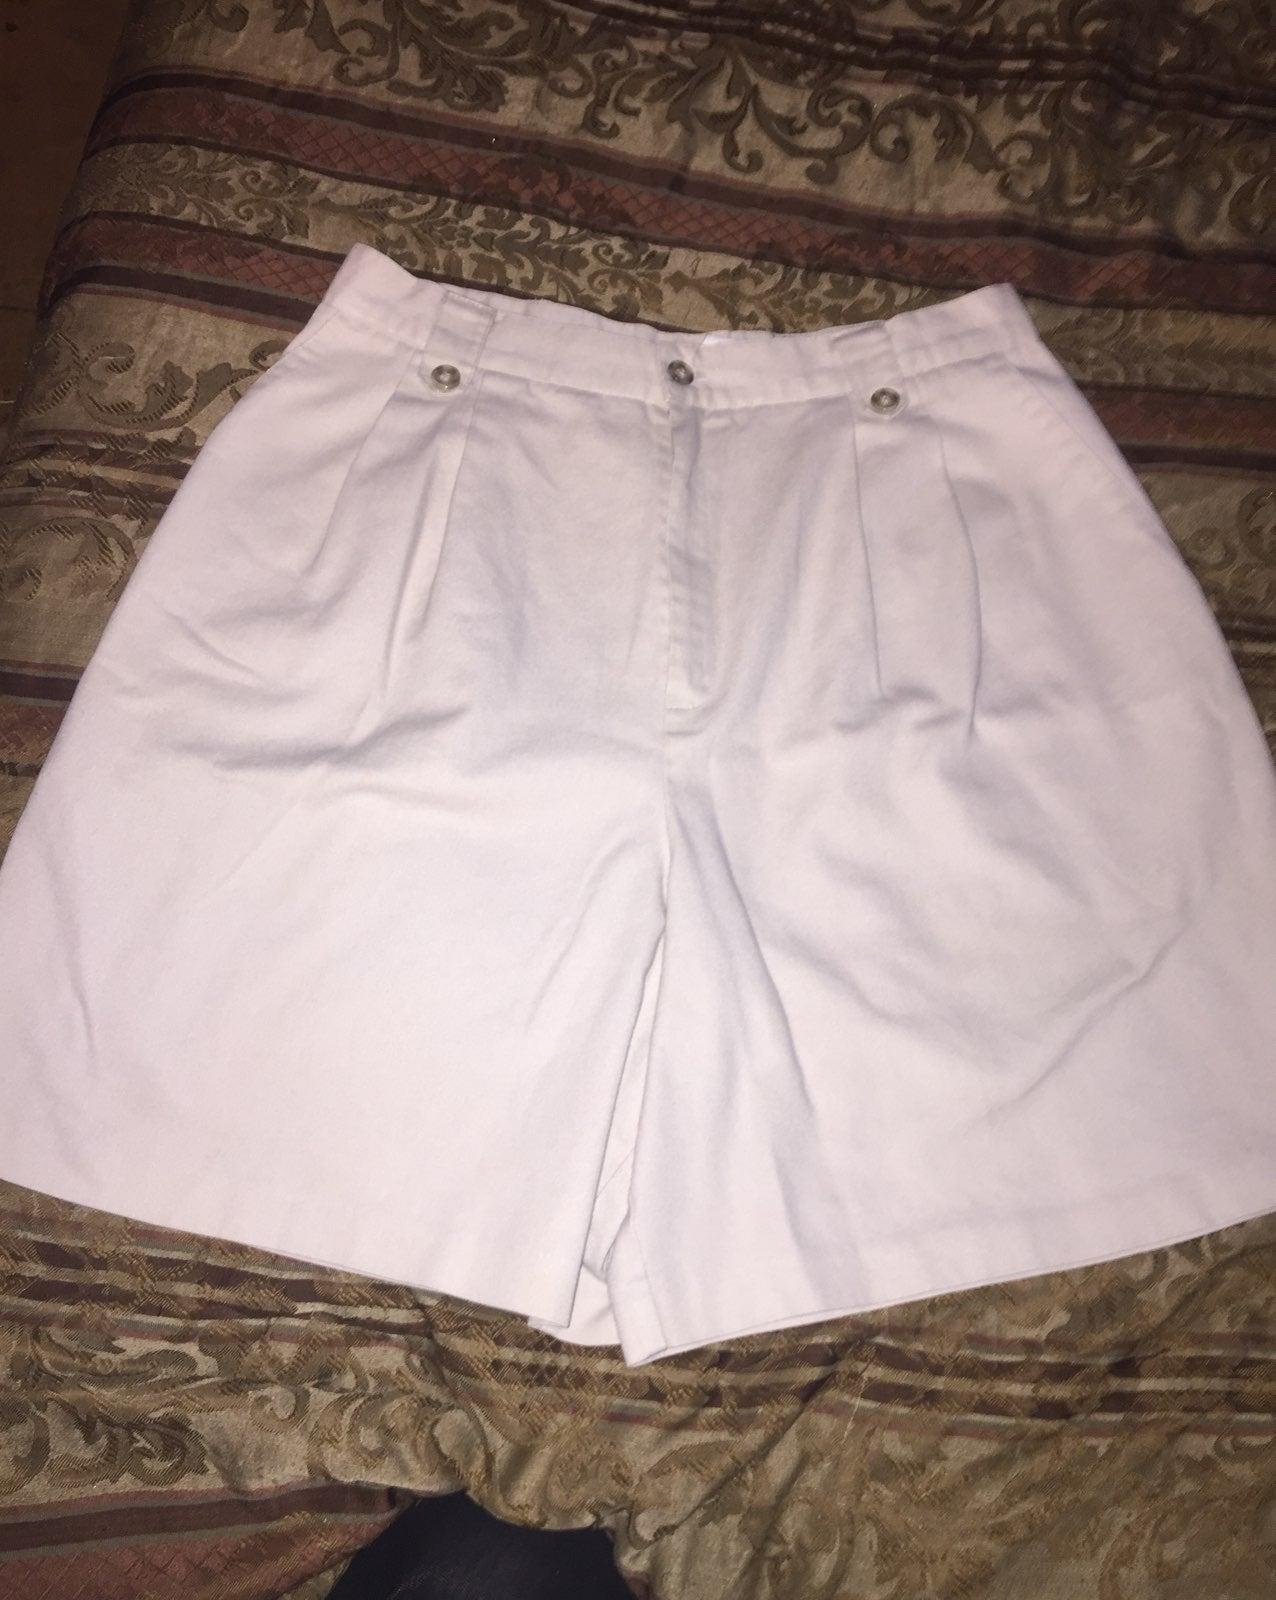 Briggs NY High Waisted Shorts 14